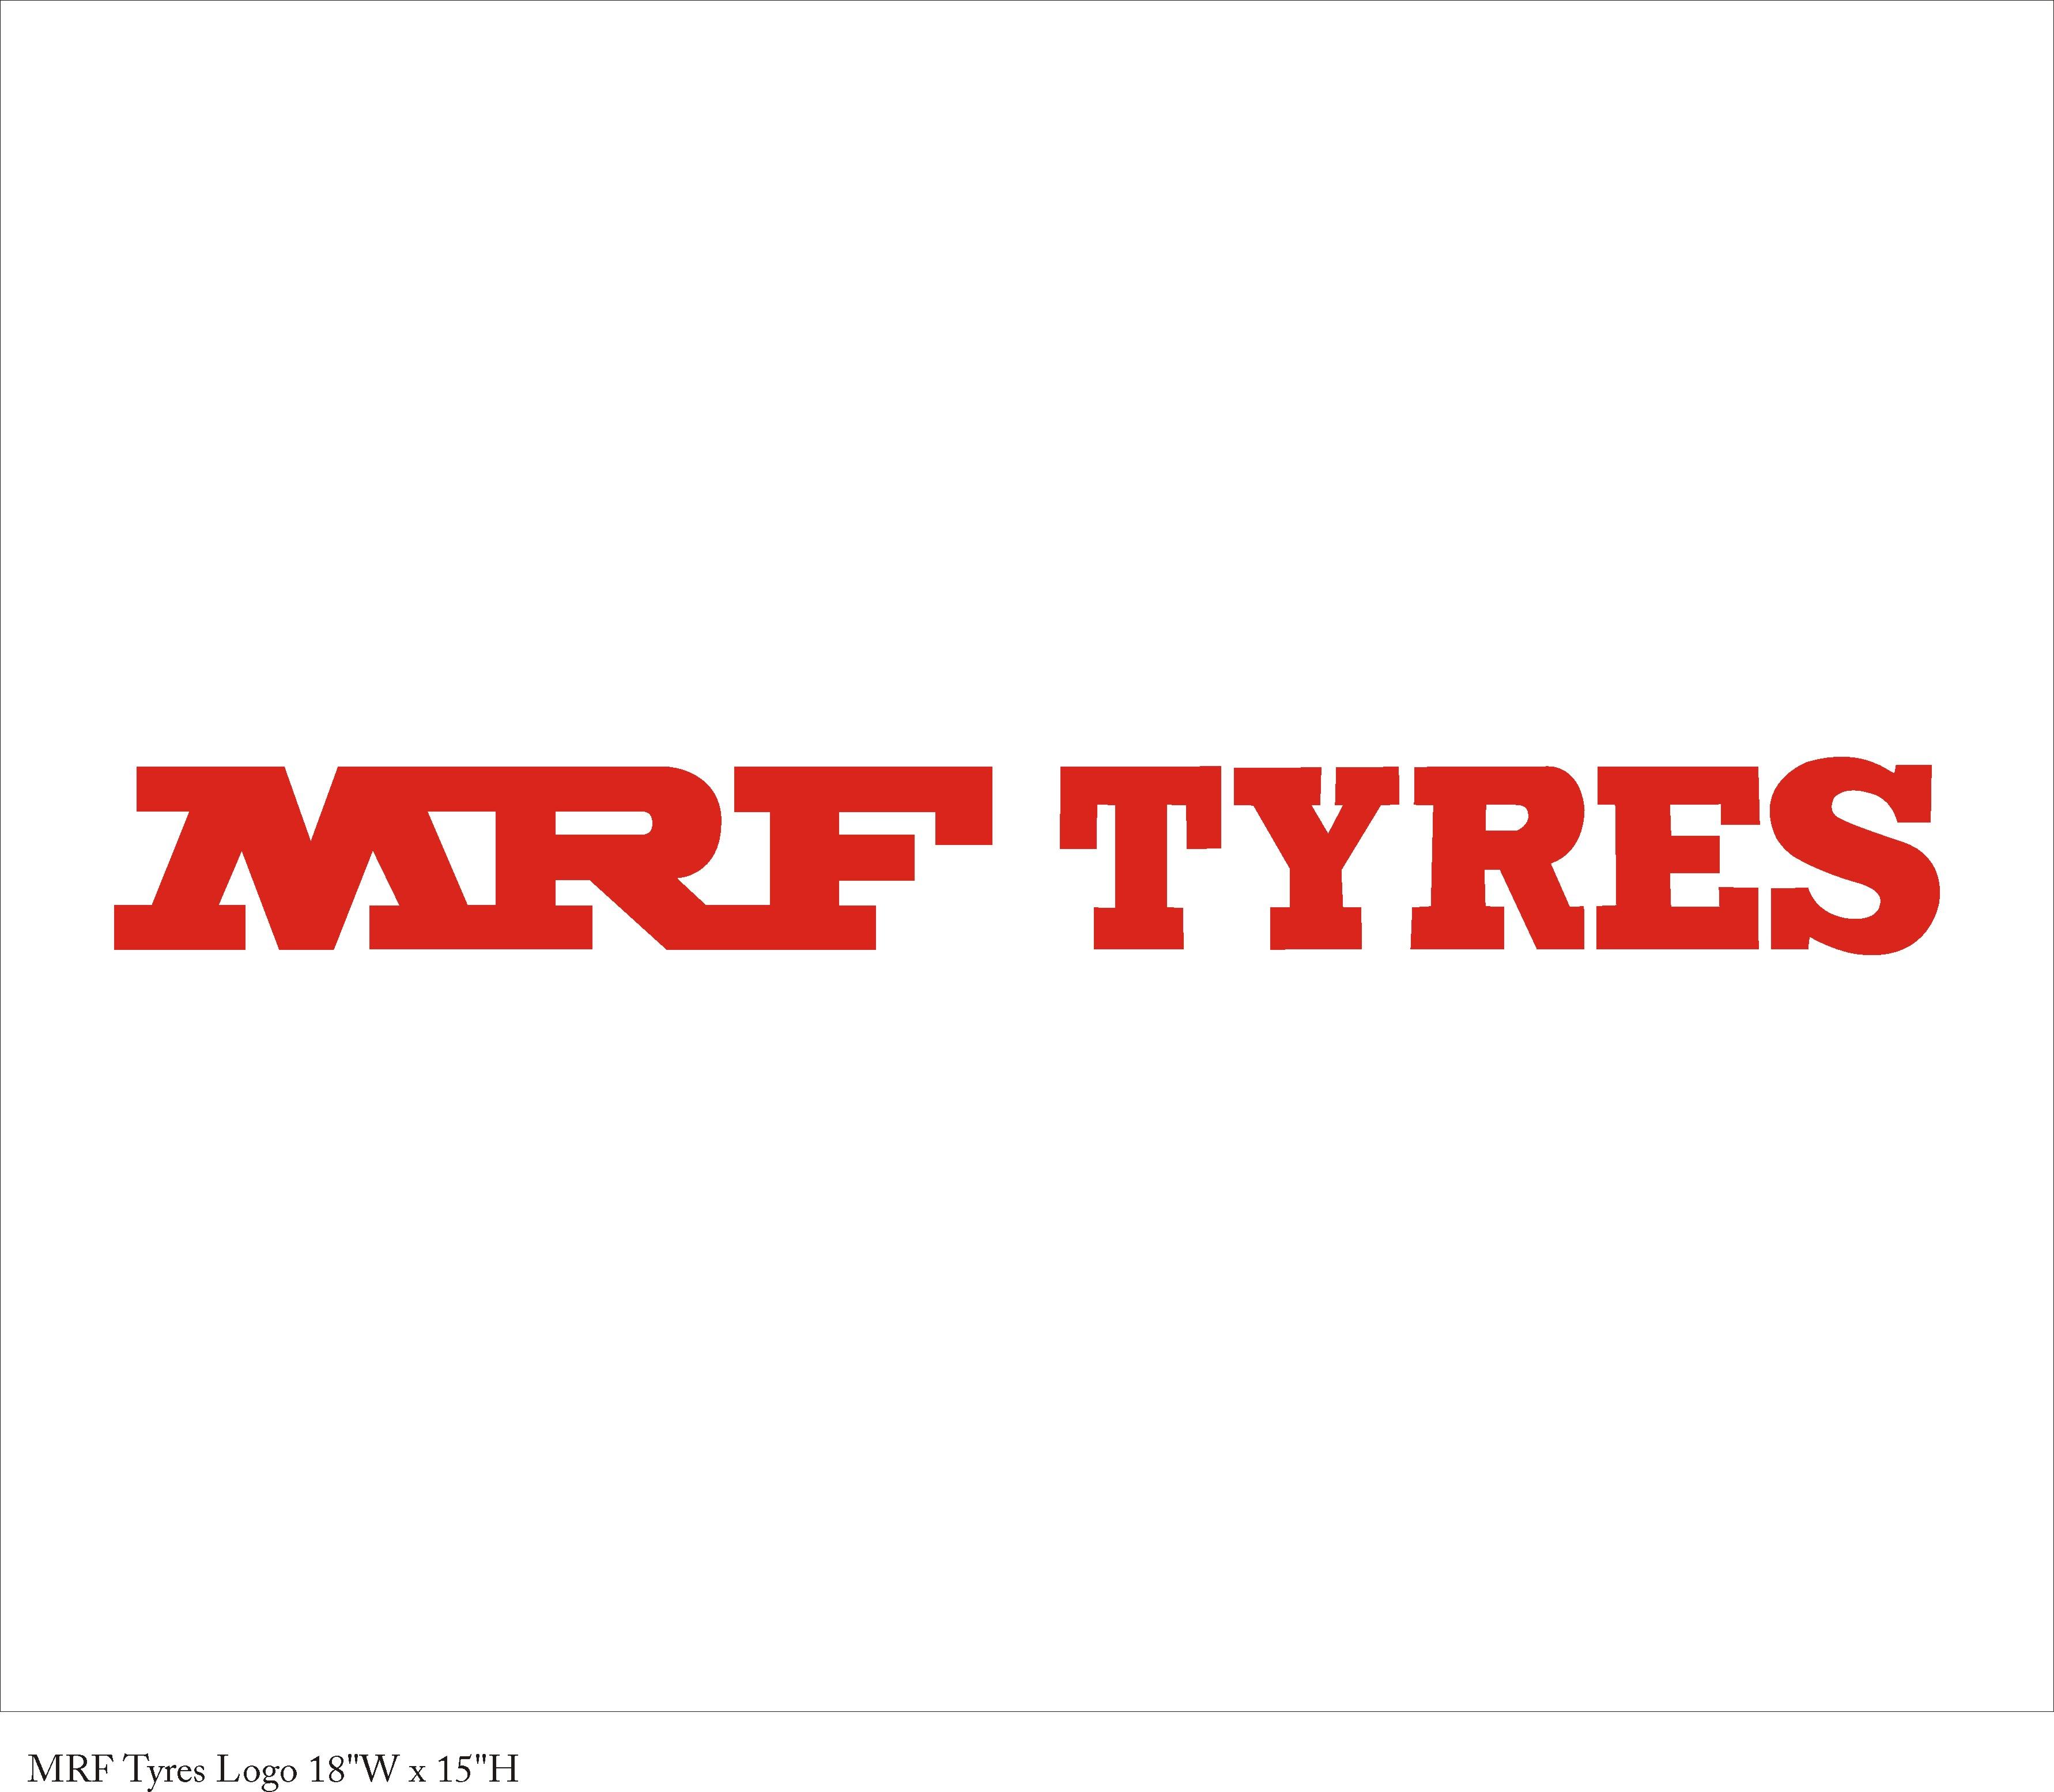 MRF tyres logo 2 -18 x 15 in